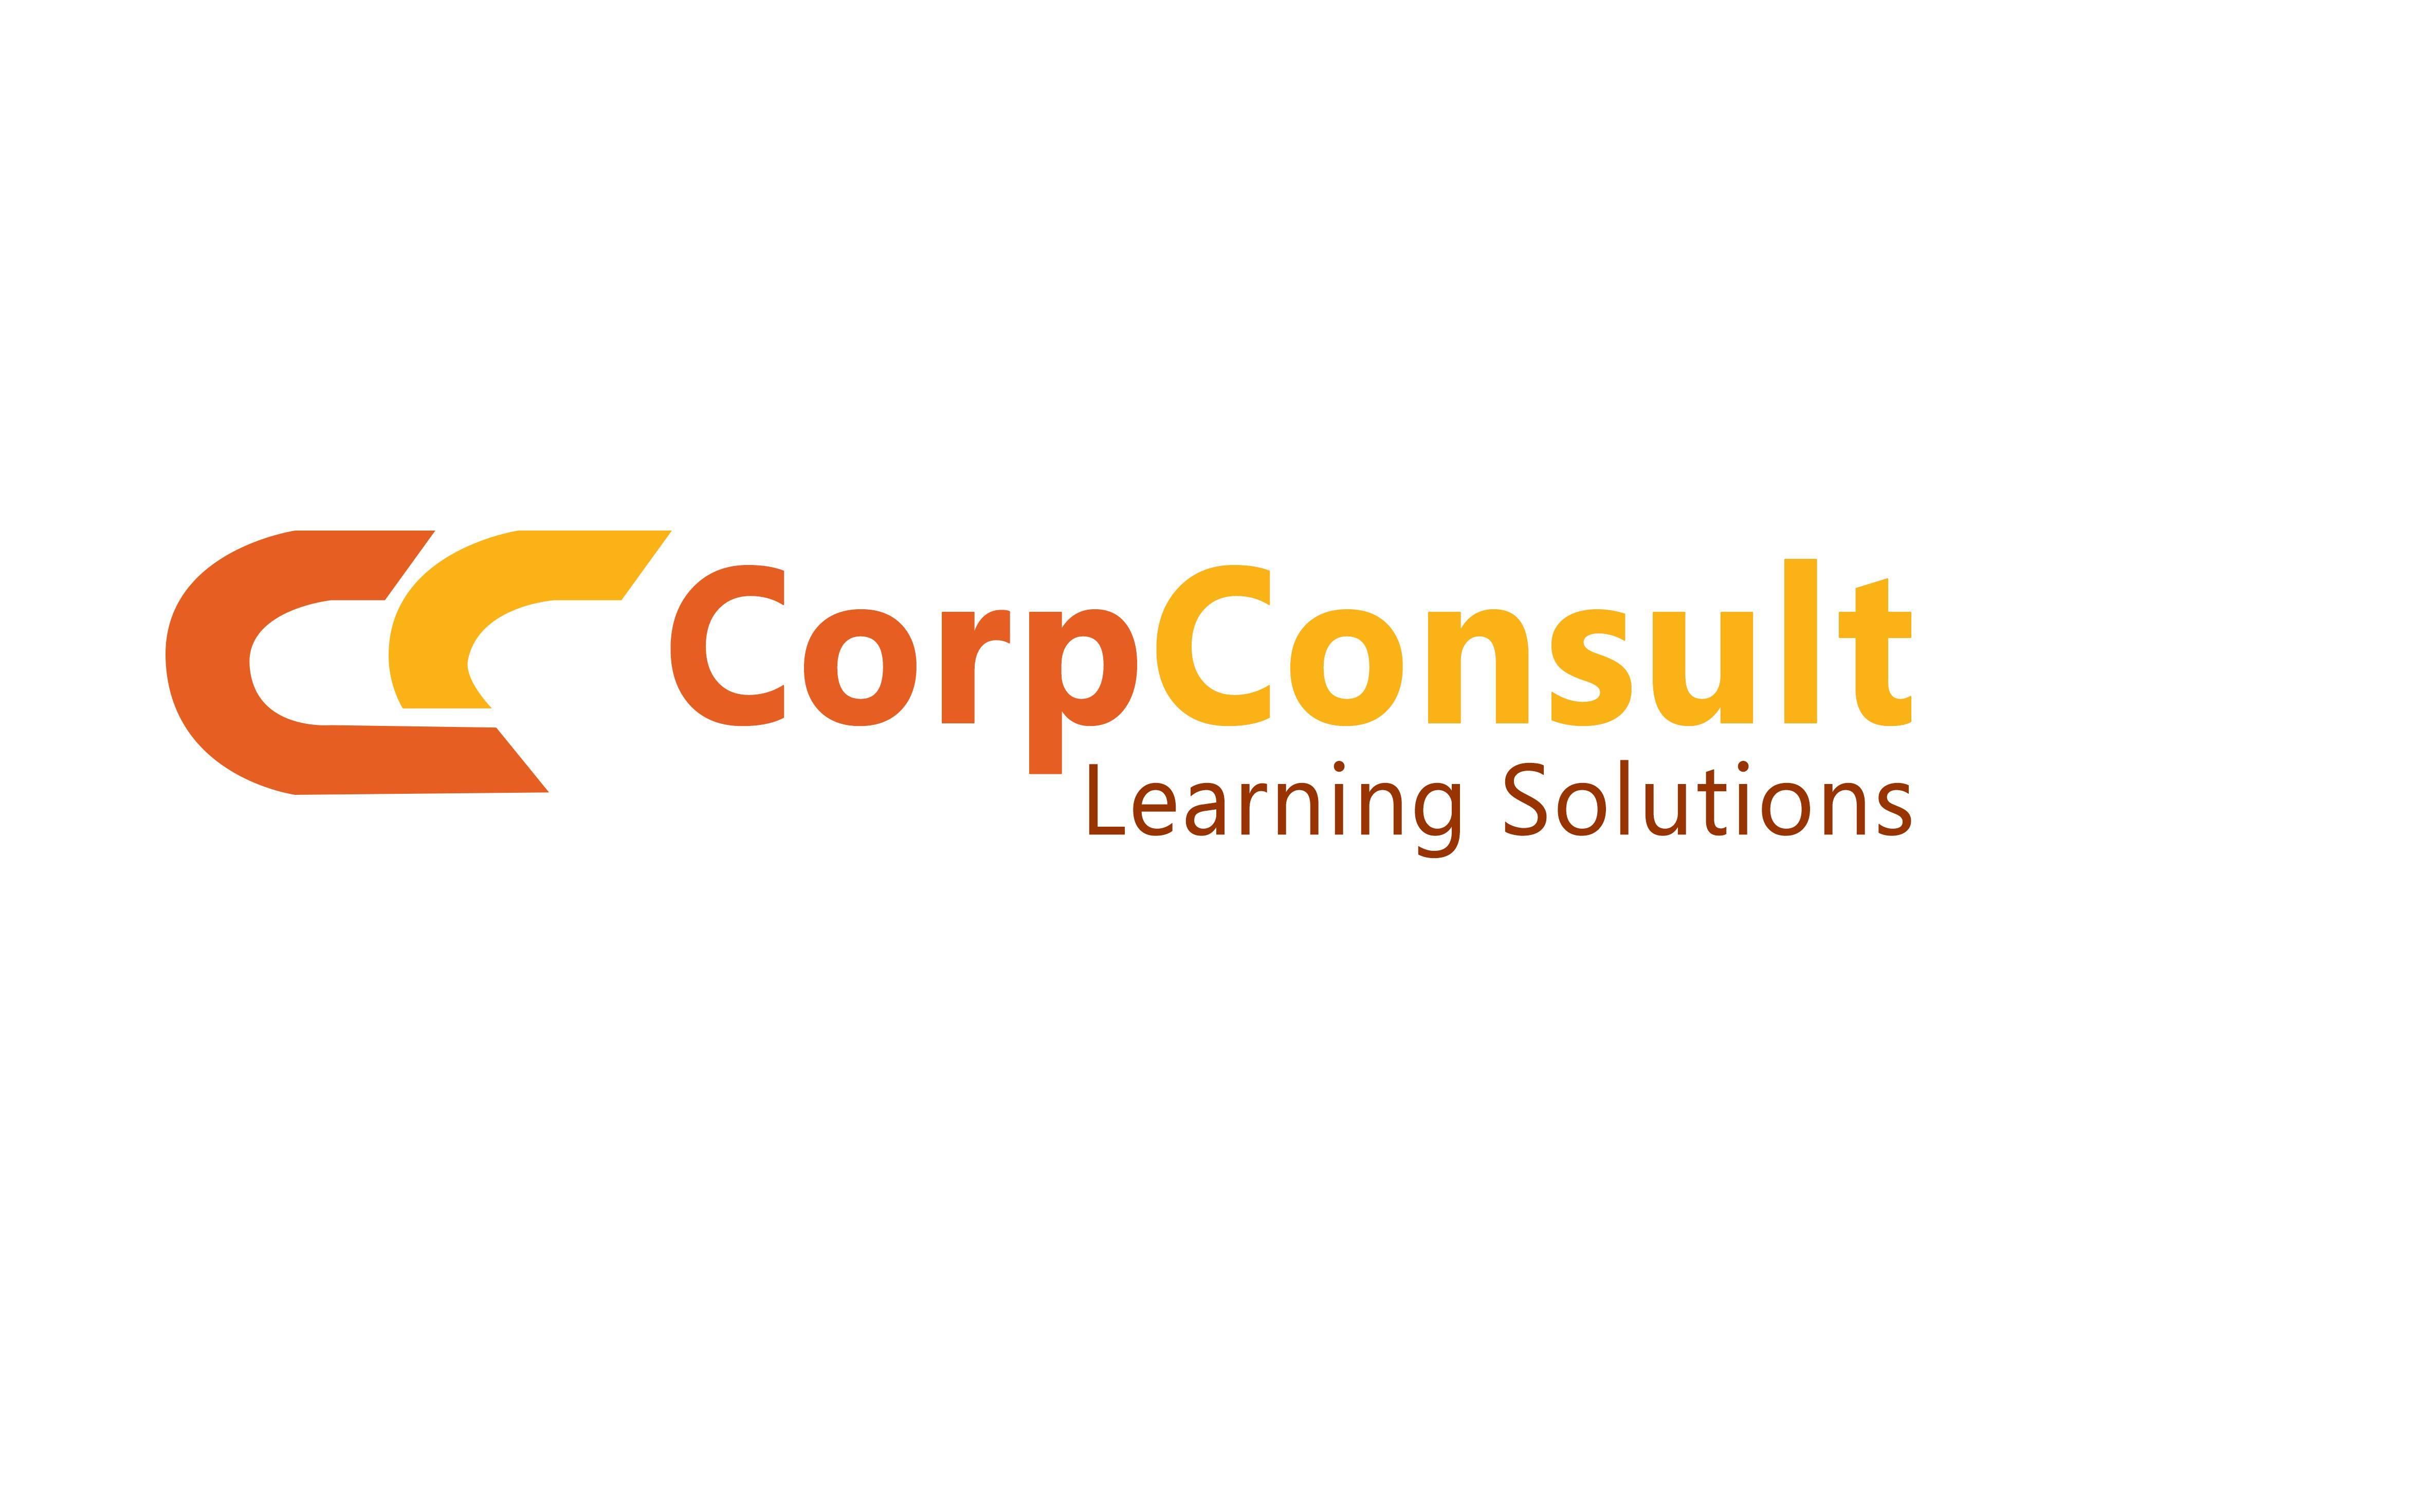 CorpConsult Job Openings